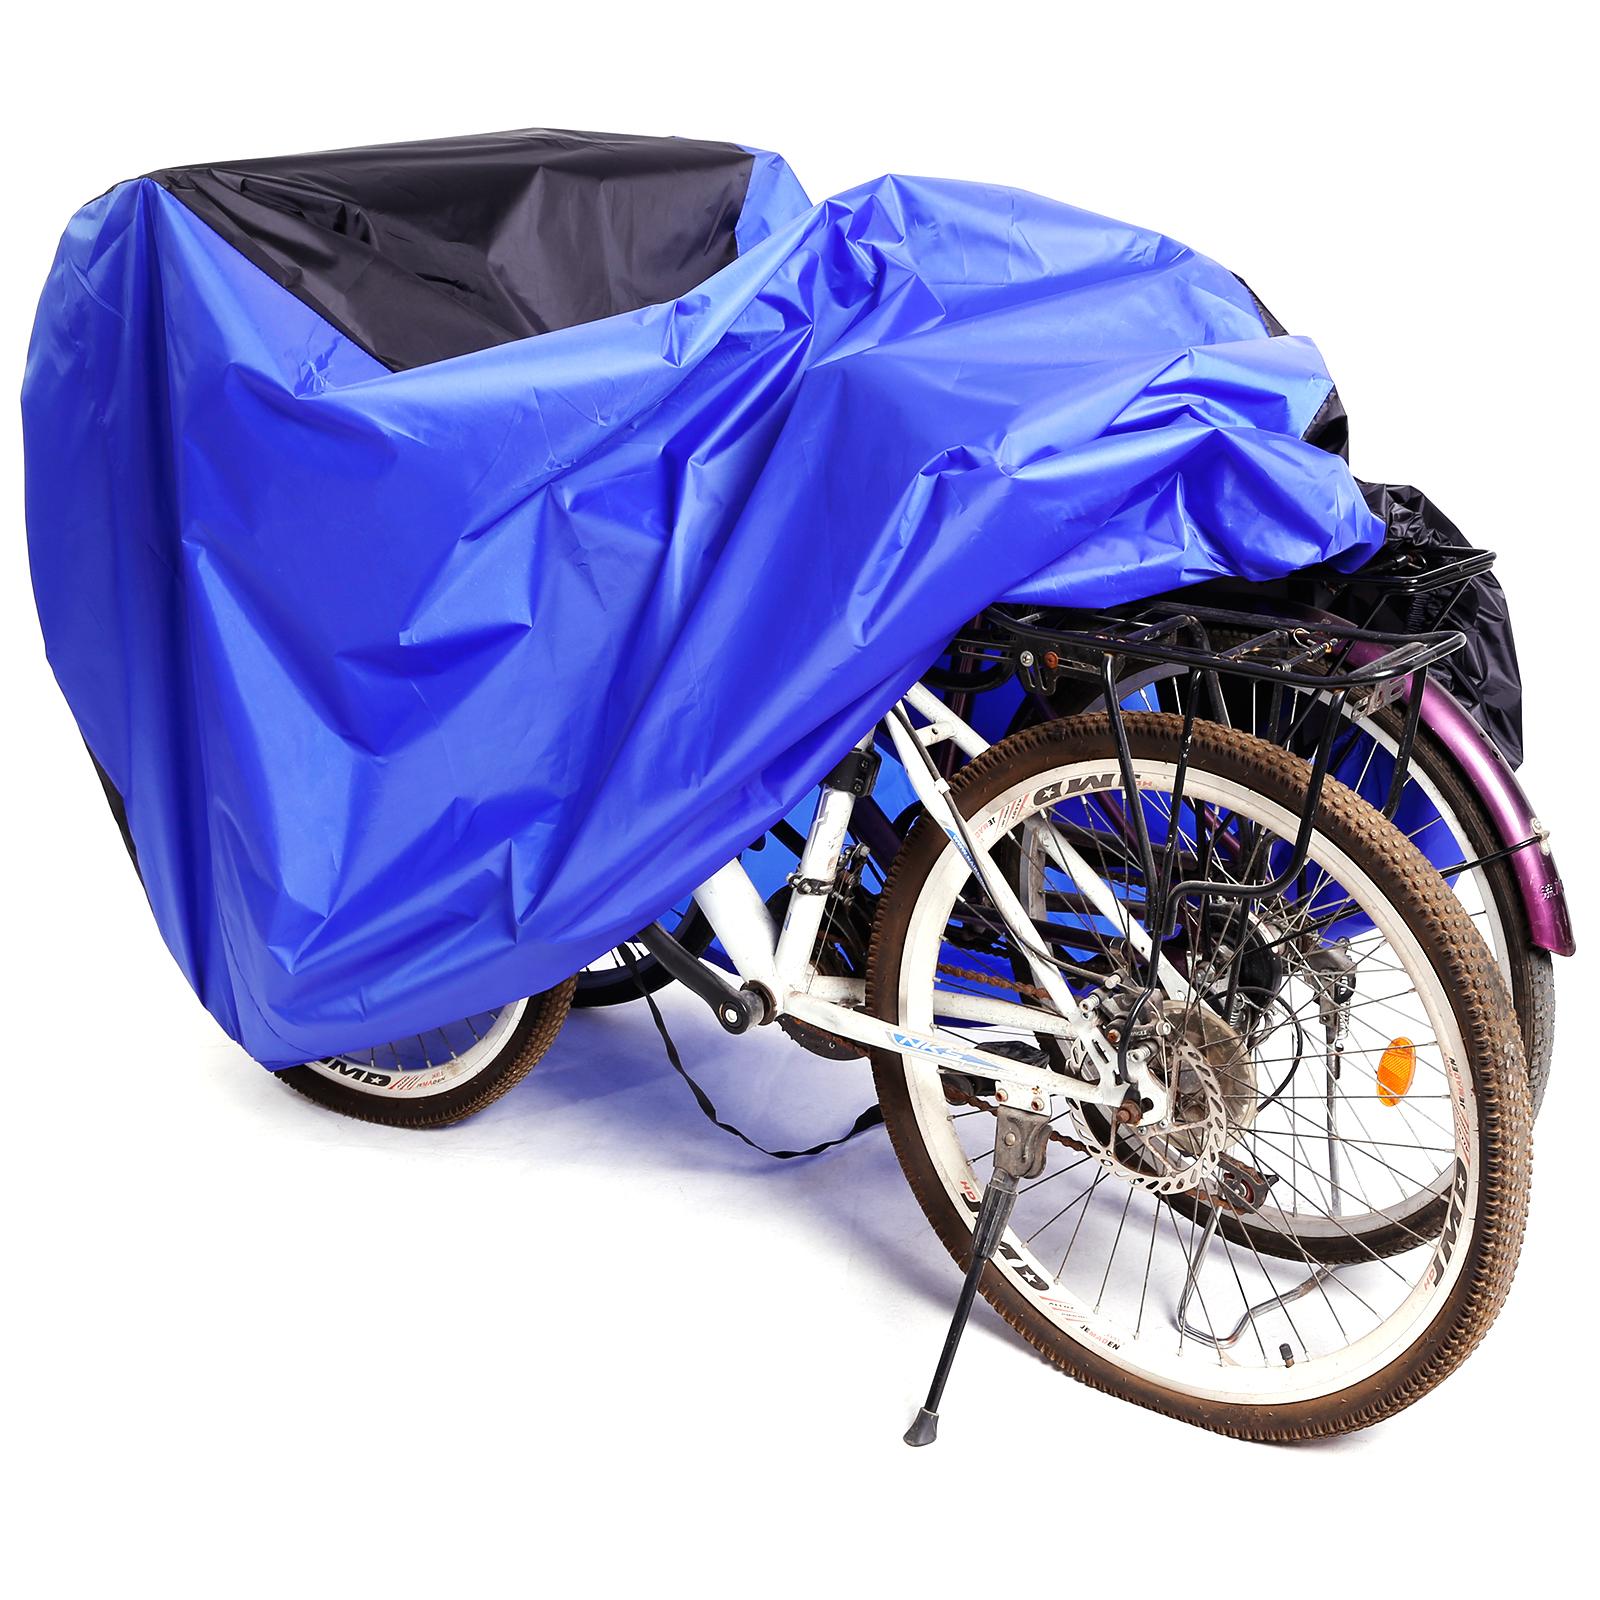 Fahrradgarage Rollerabdeckung Fahrradabdeckung Fahrradhülle Abdeckplane blau